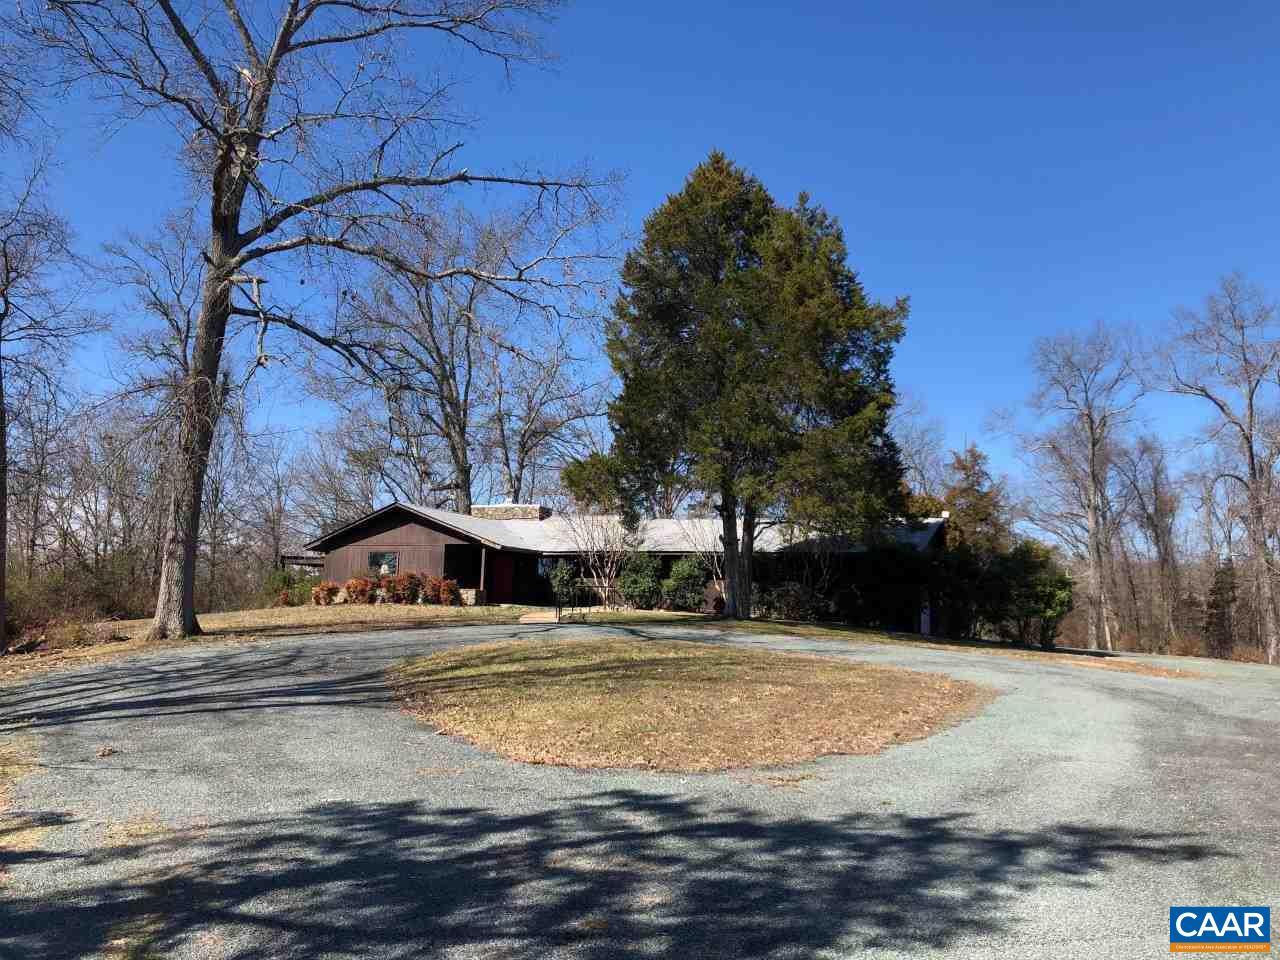 290 LLAMA FARM RD, CHARLOTTESVILLE, VA 22901